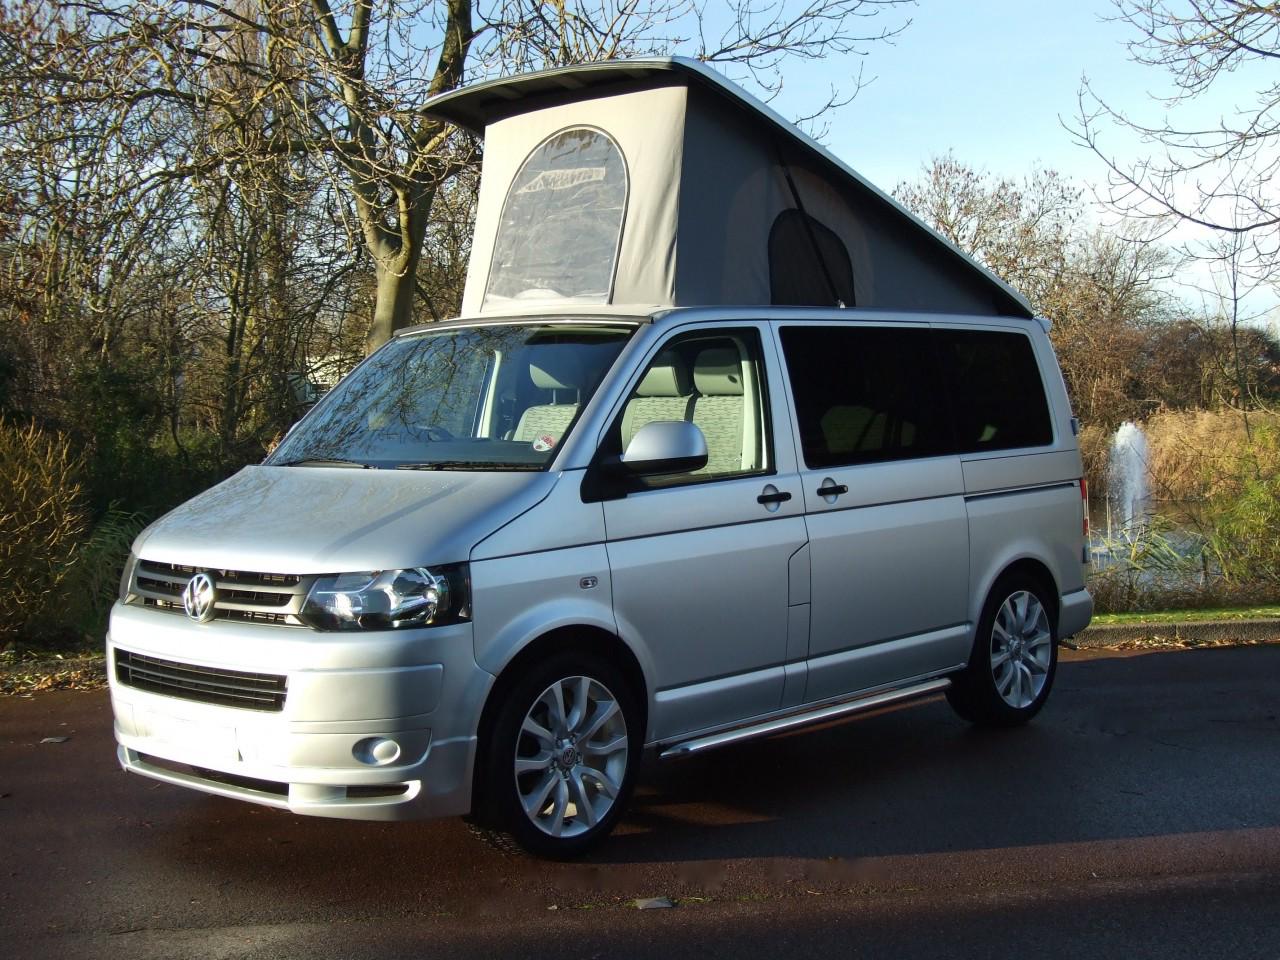 VW-Campervan-Hire-Sussex